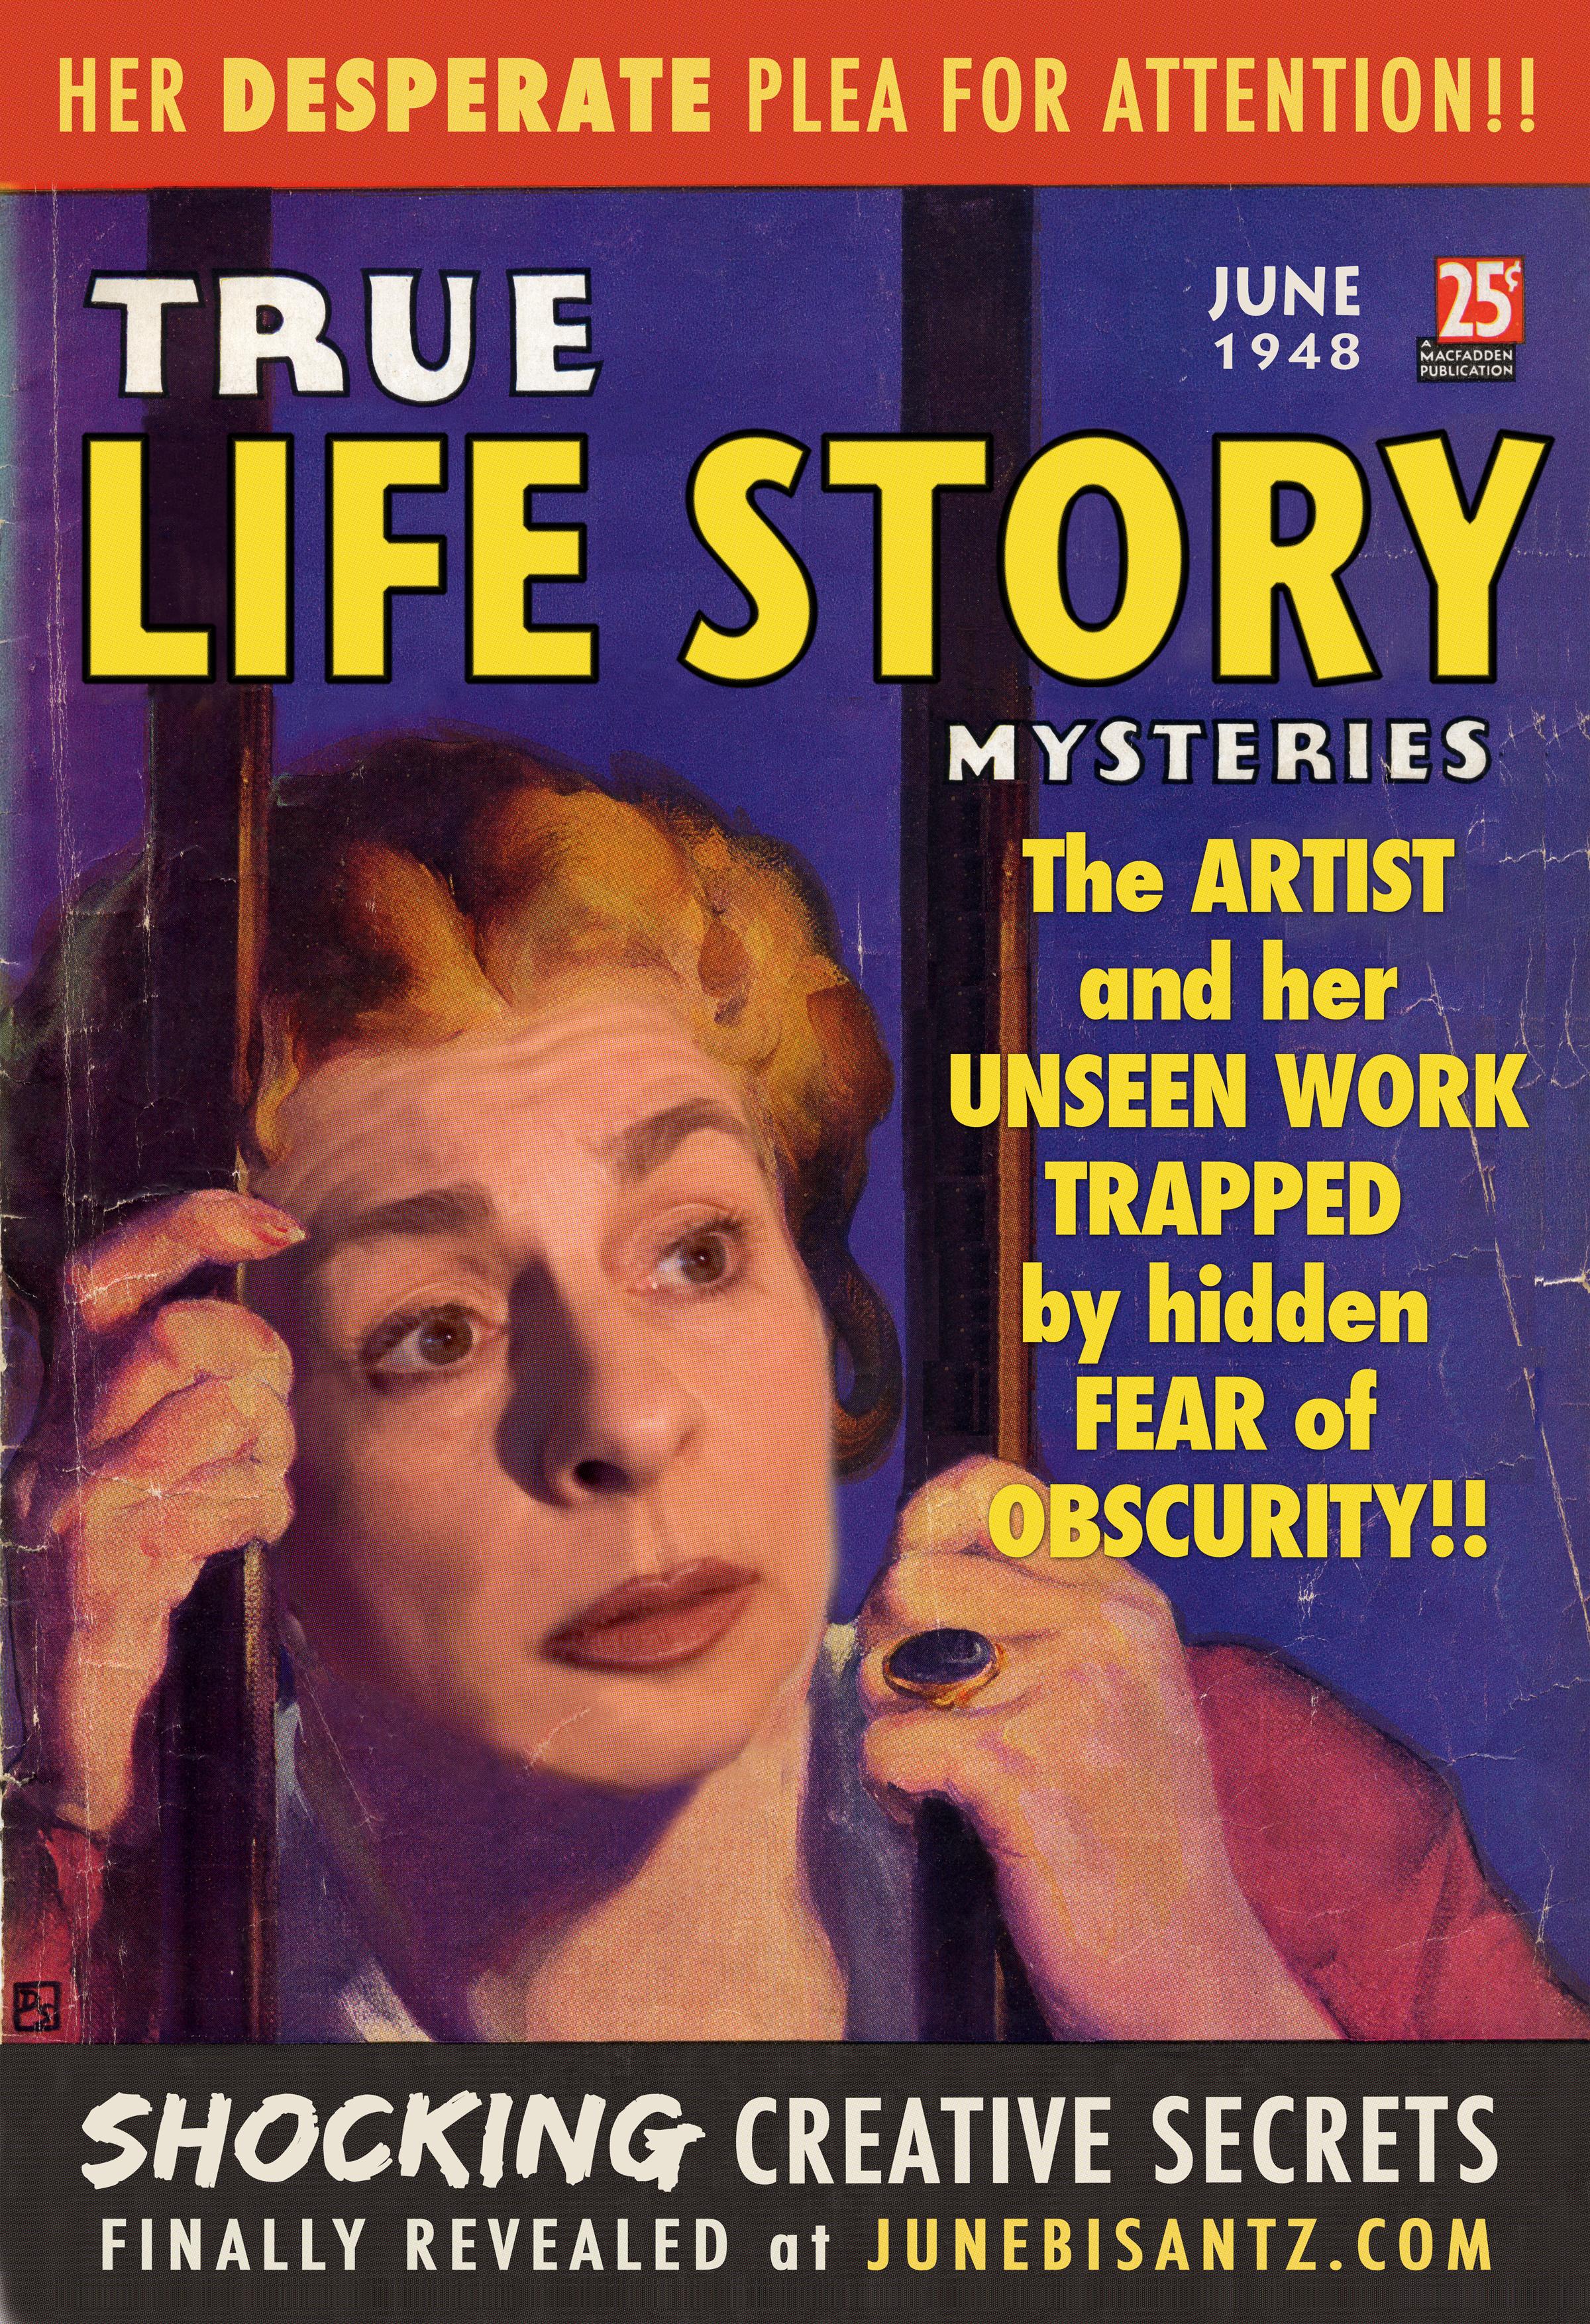 True Life Story Mysteries